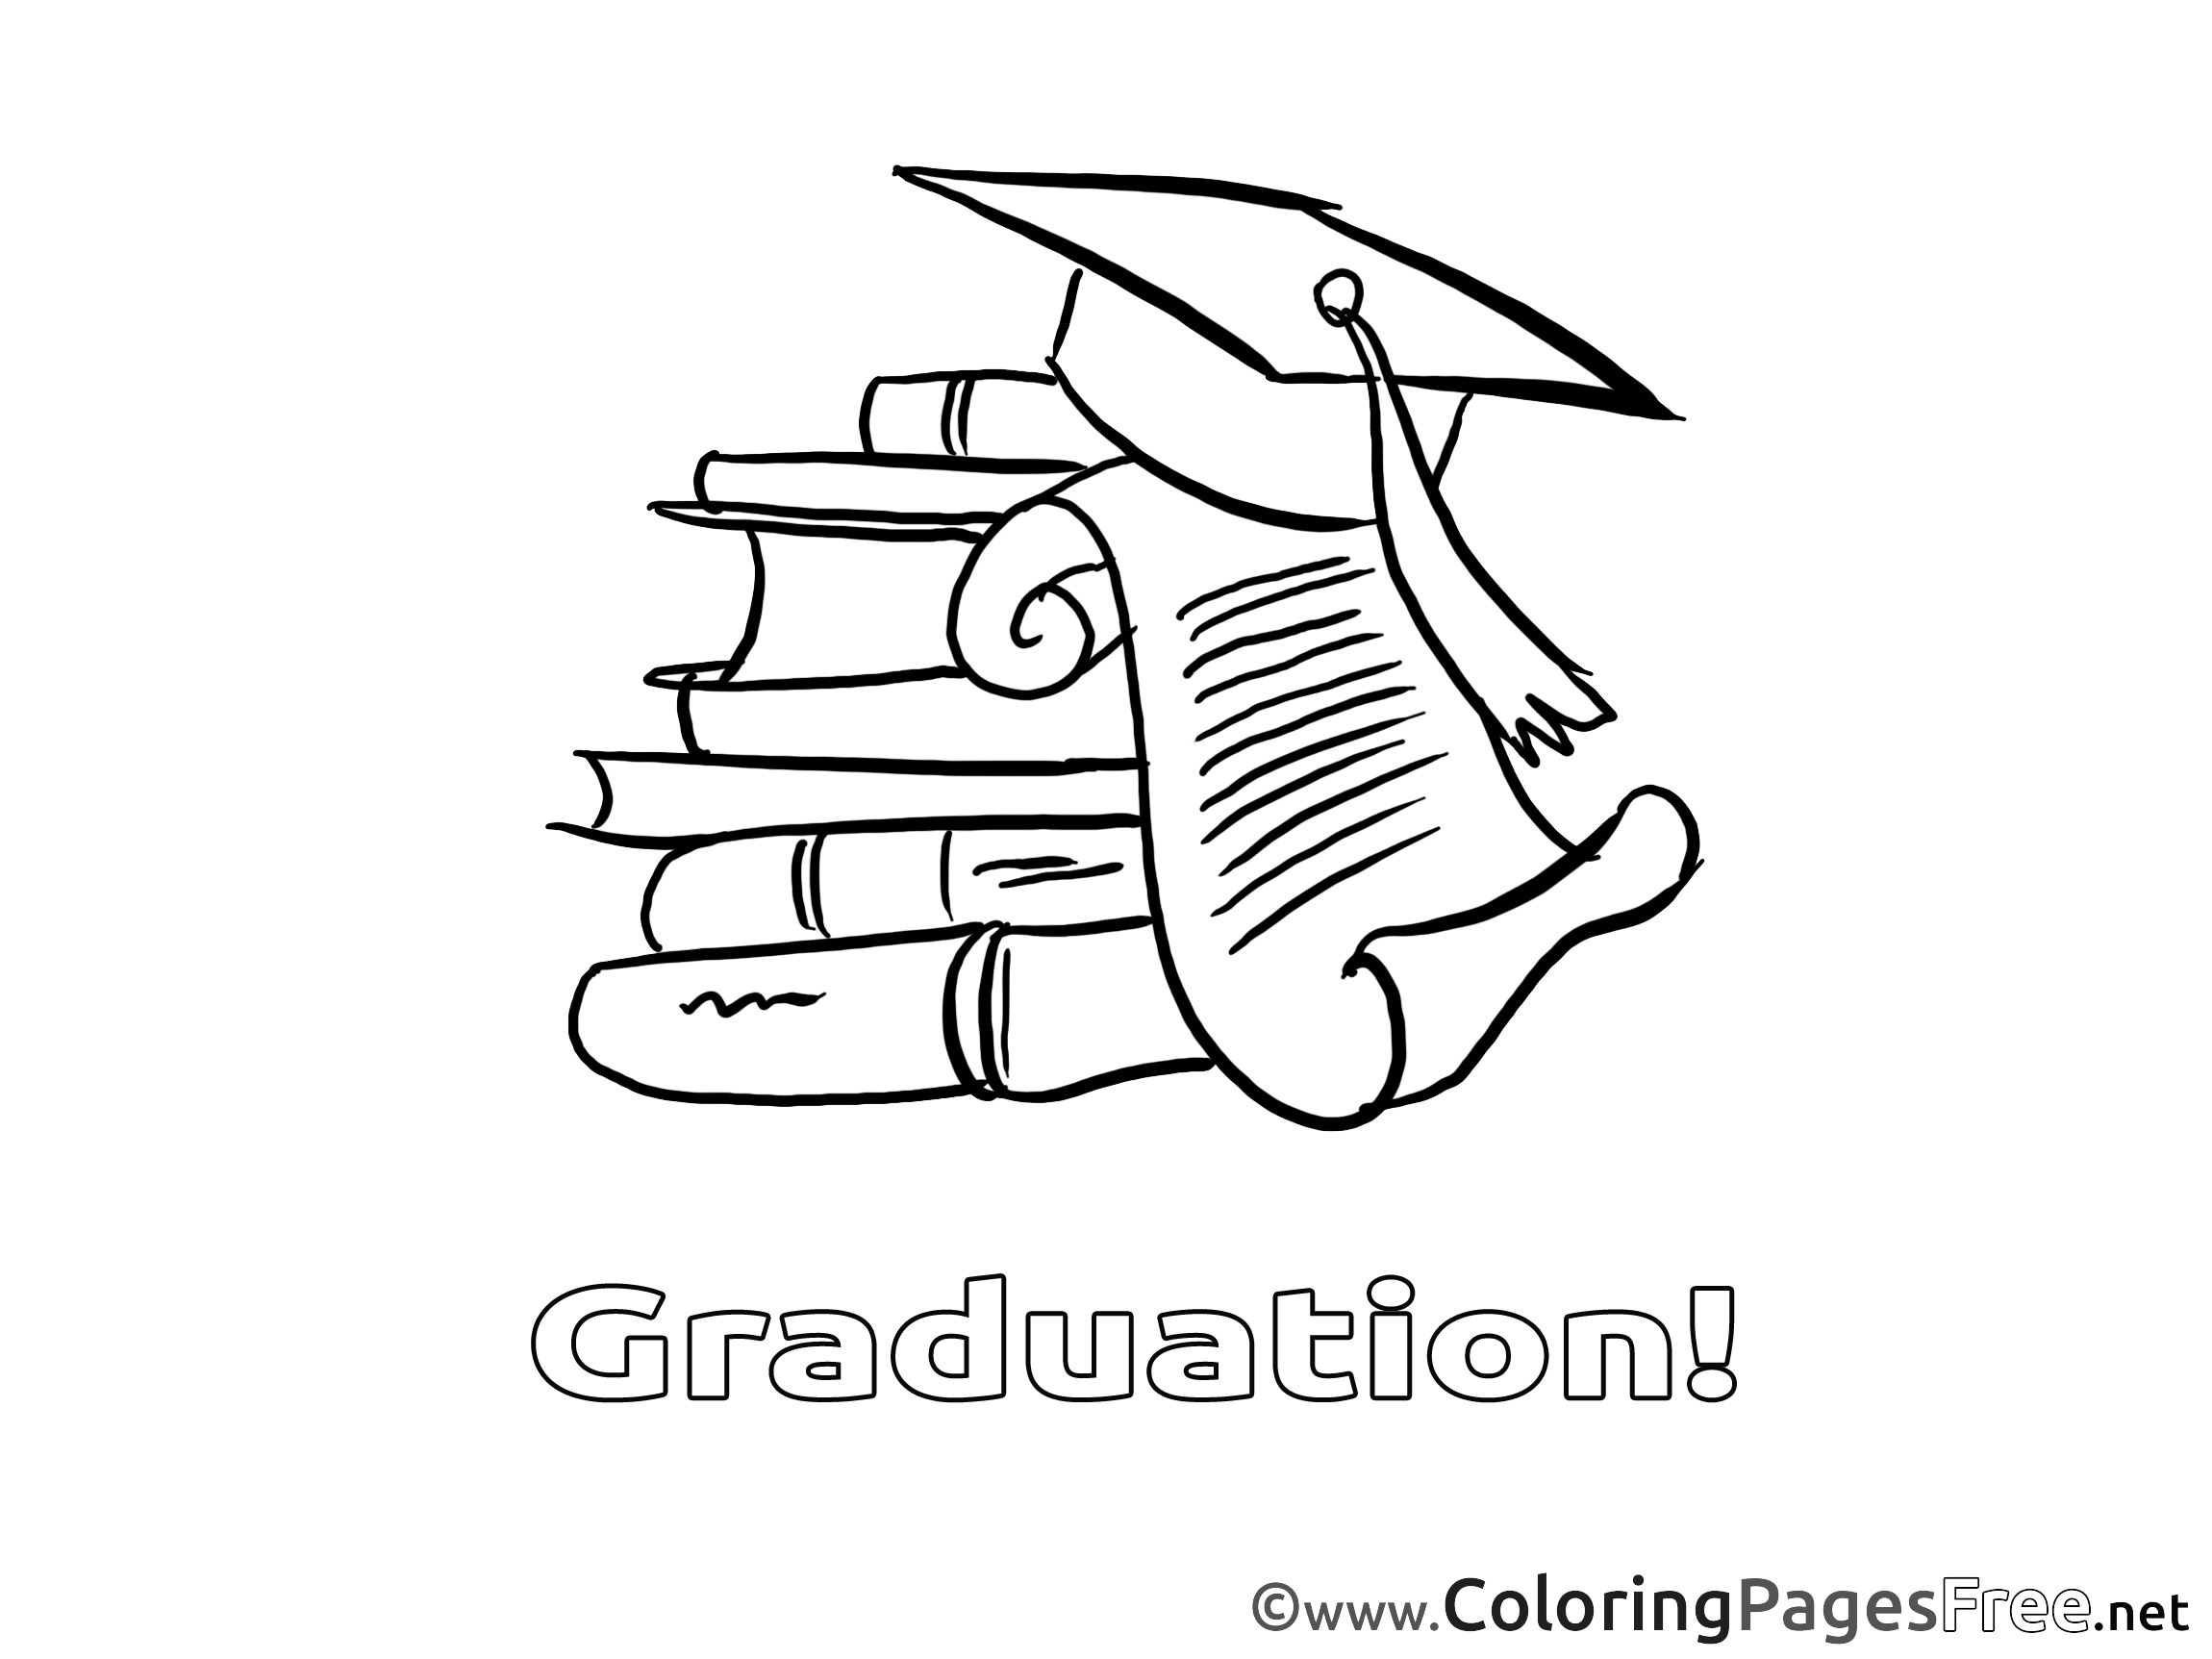 Coloring pages graduation - Coloring Pages Graduation 41